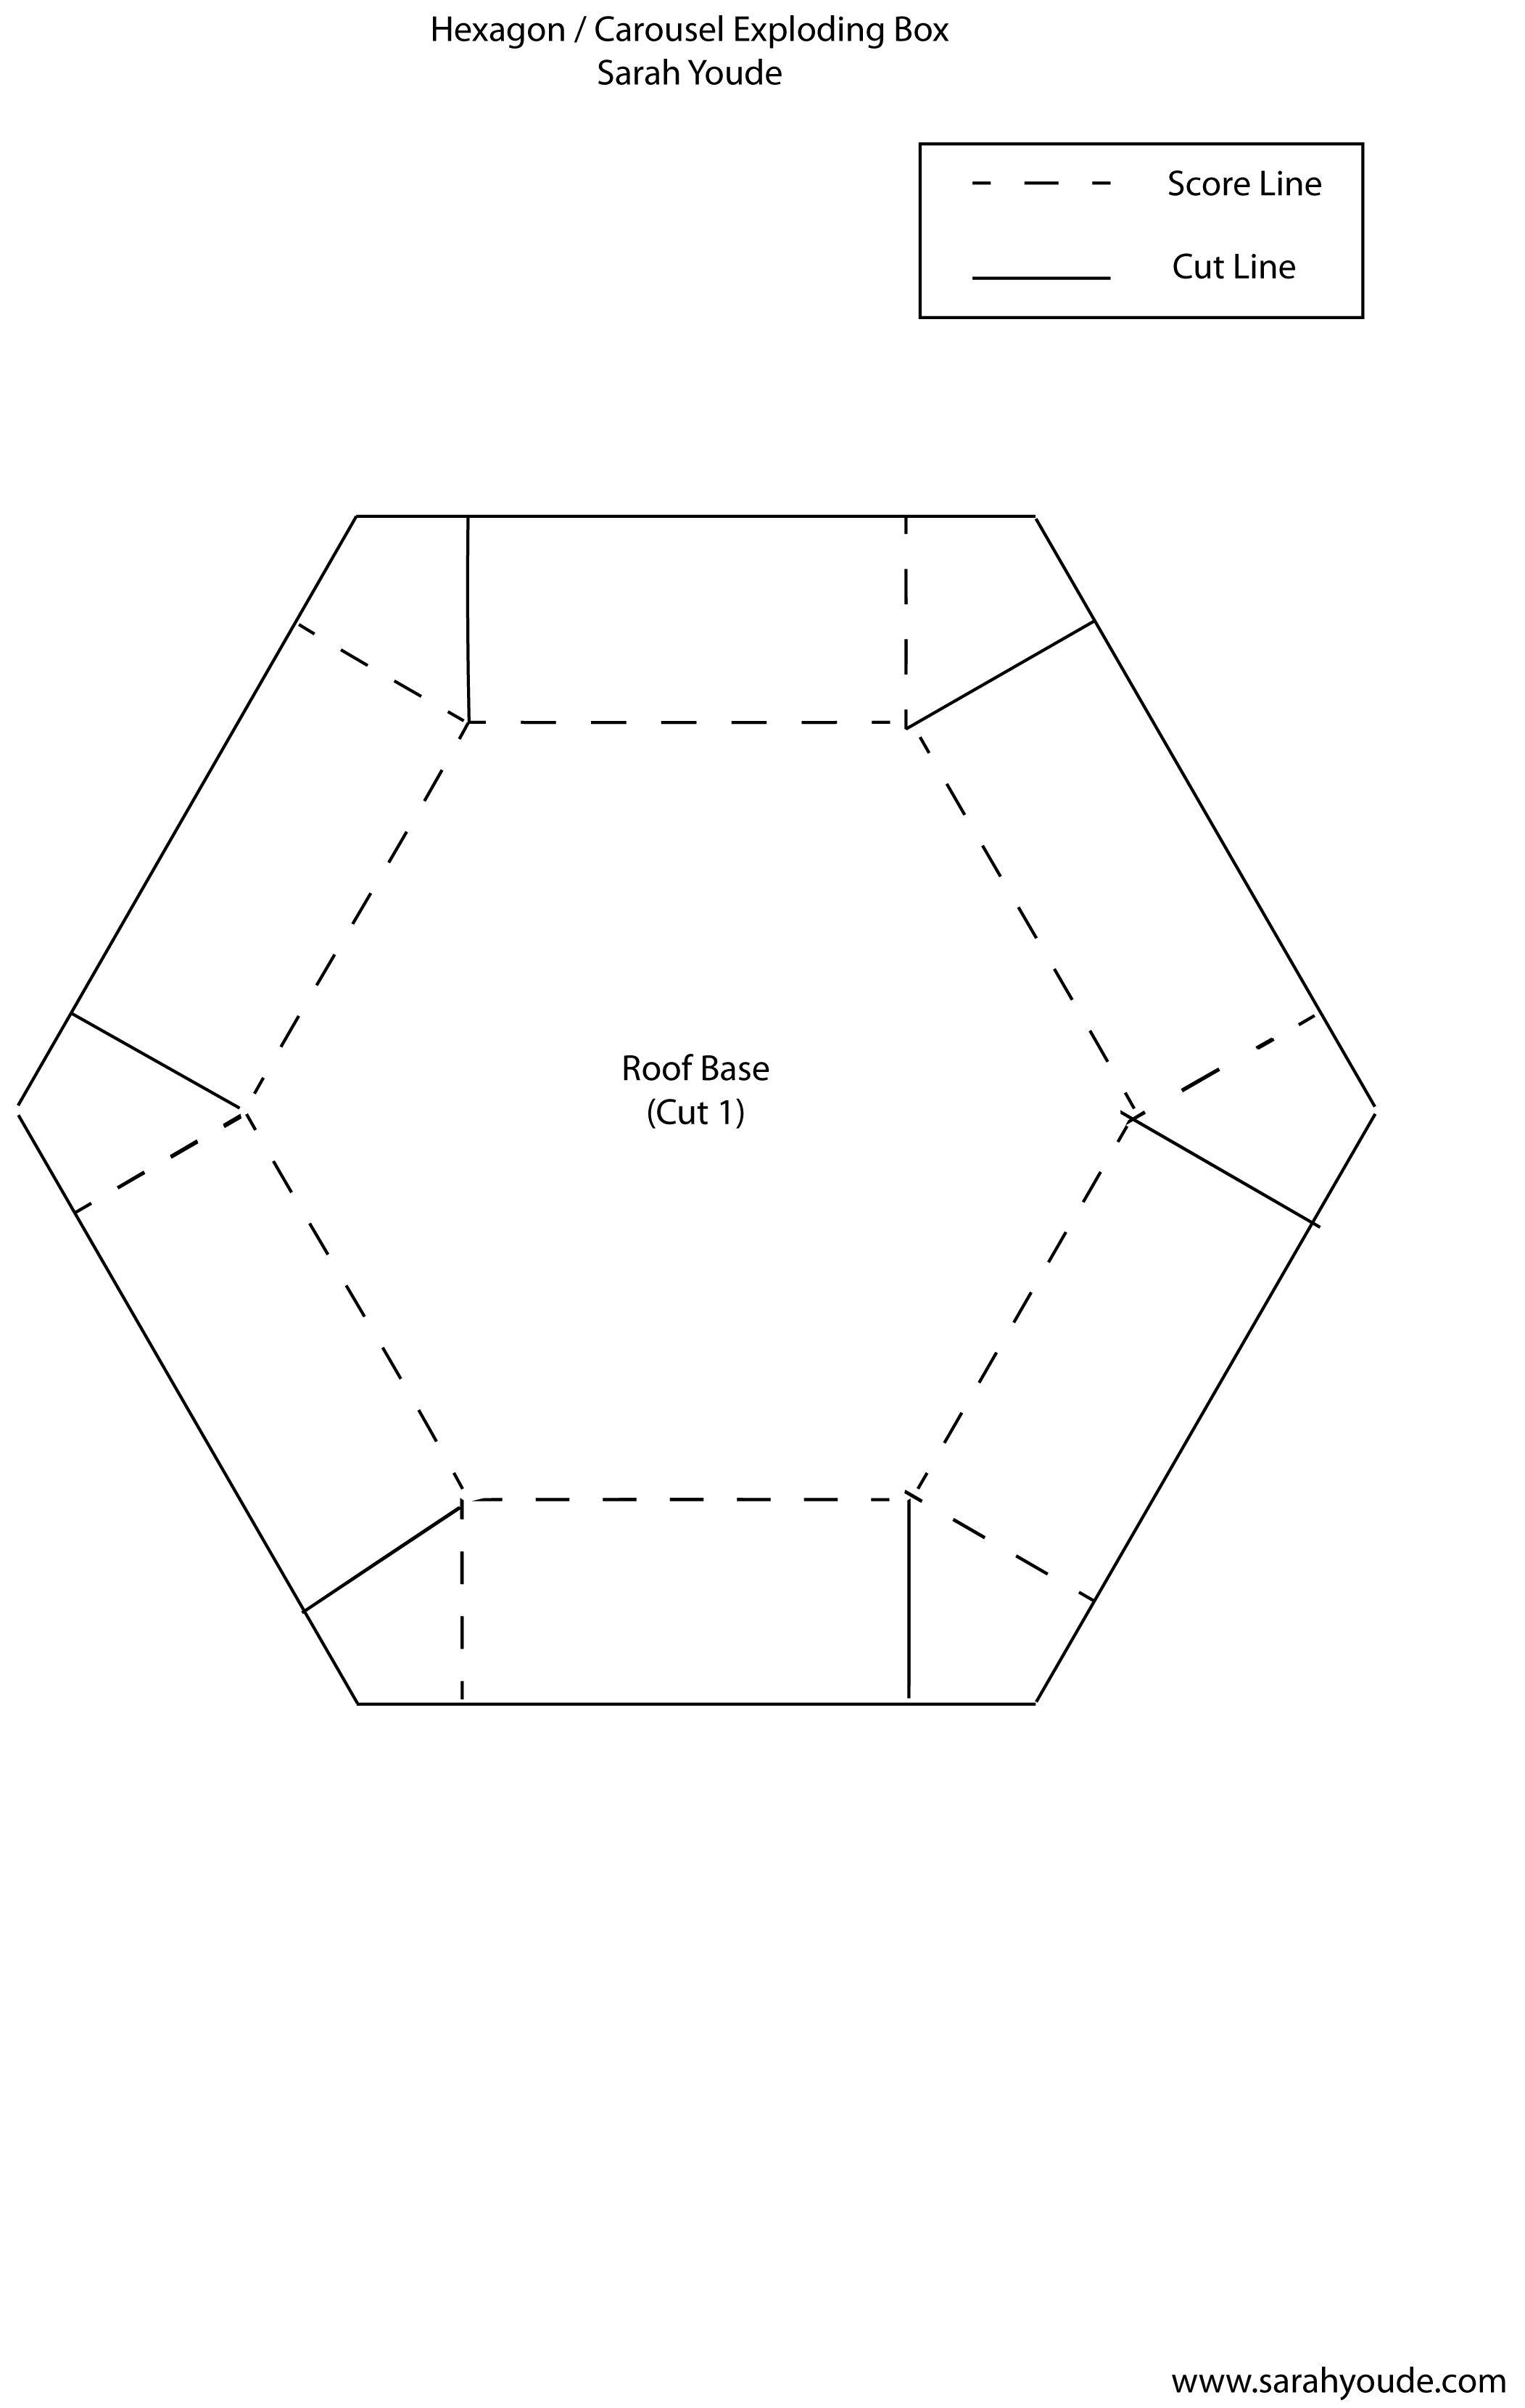 It's Me, Sarah: Exploding Hexagon Carousel Box - Video ... - photo#39